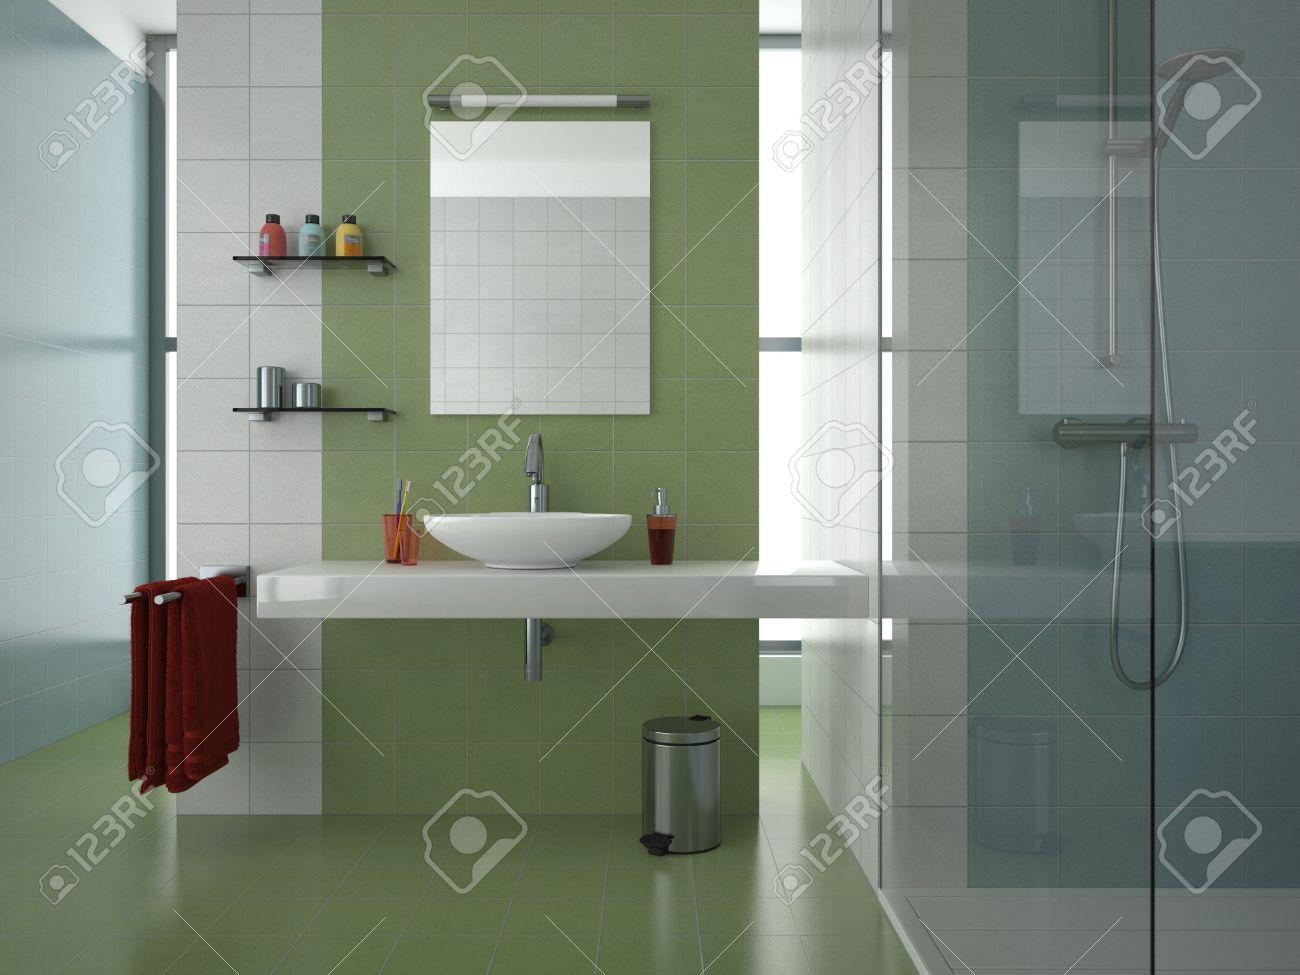 Rivestimento Bagno Mosaico Verde : Piastrelle bagno verdi free attraente piastrelle bagno colore